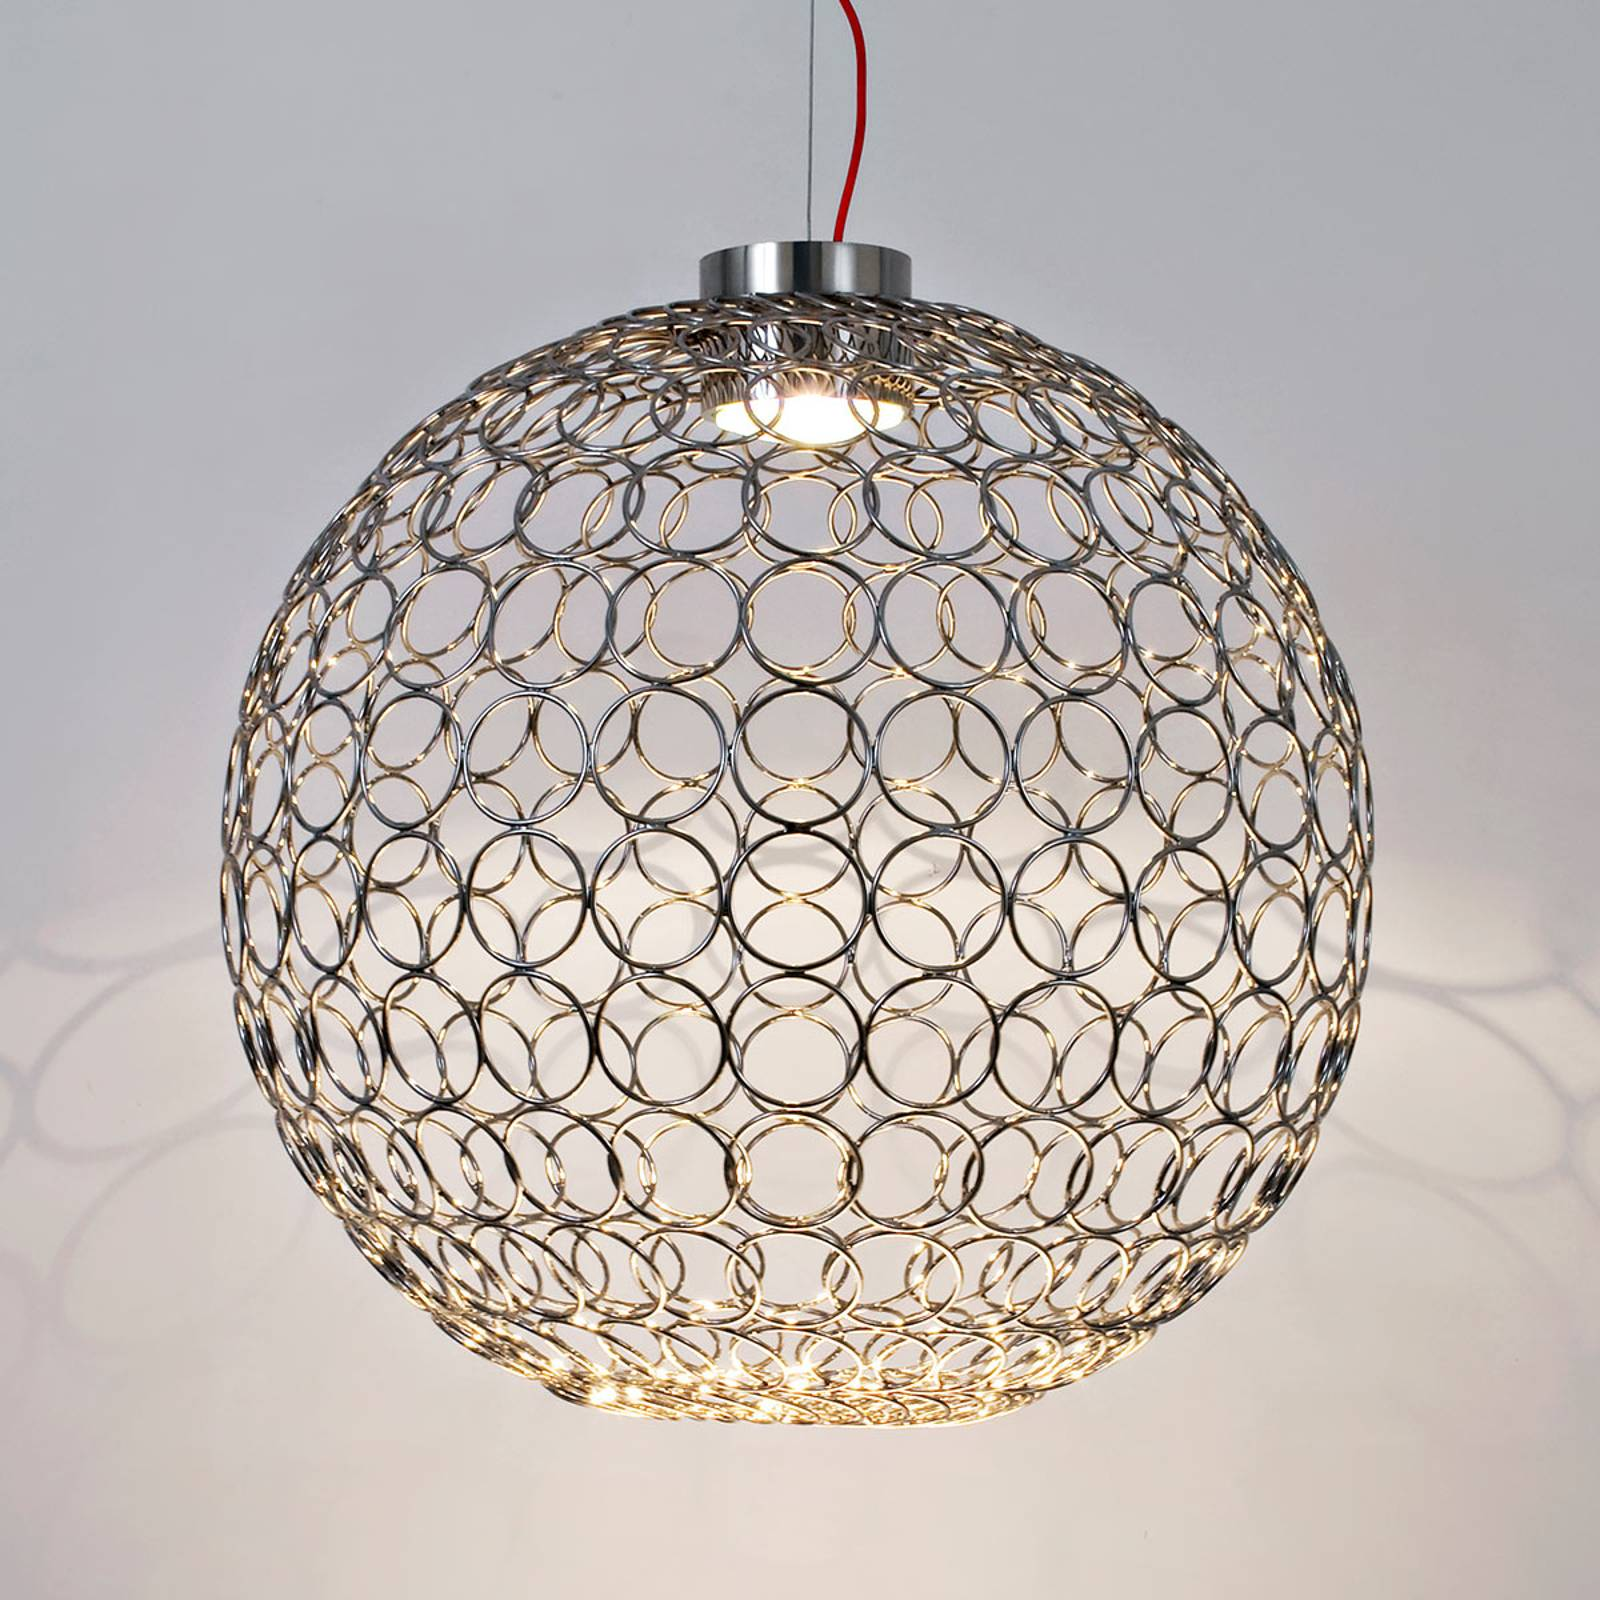 Terzani G.R.A. - designer-LED hanglamp, 54 cm